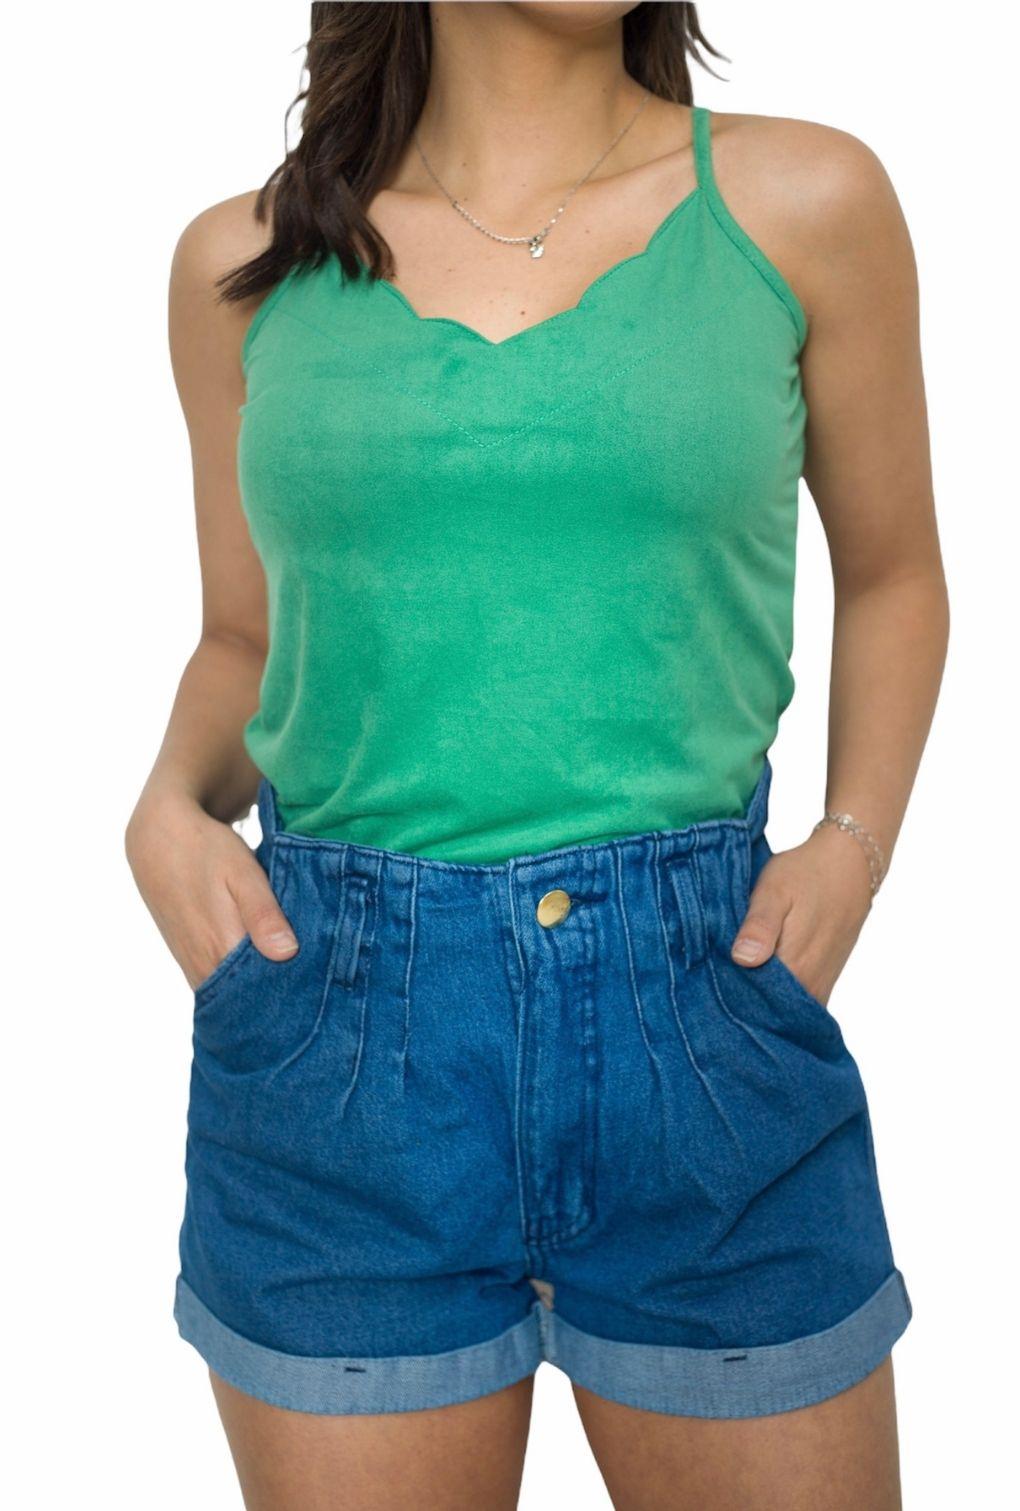 Shorts Jeans Feminino Curto Com Bolso E Elástico Na Cintura  - ModaStore | Moda Feminina